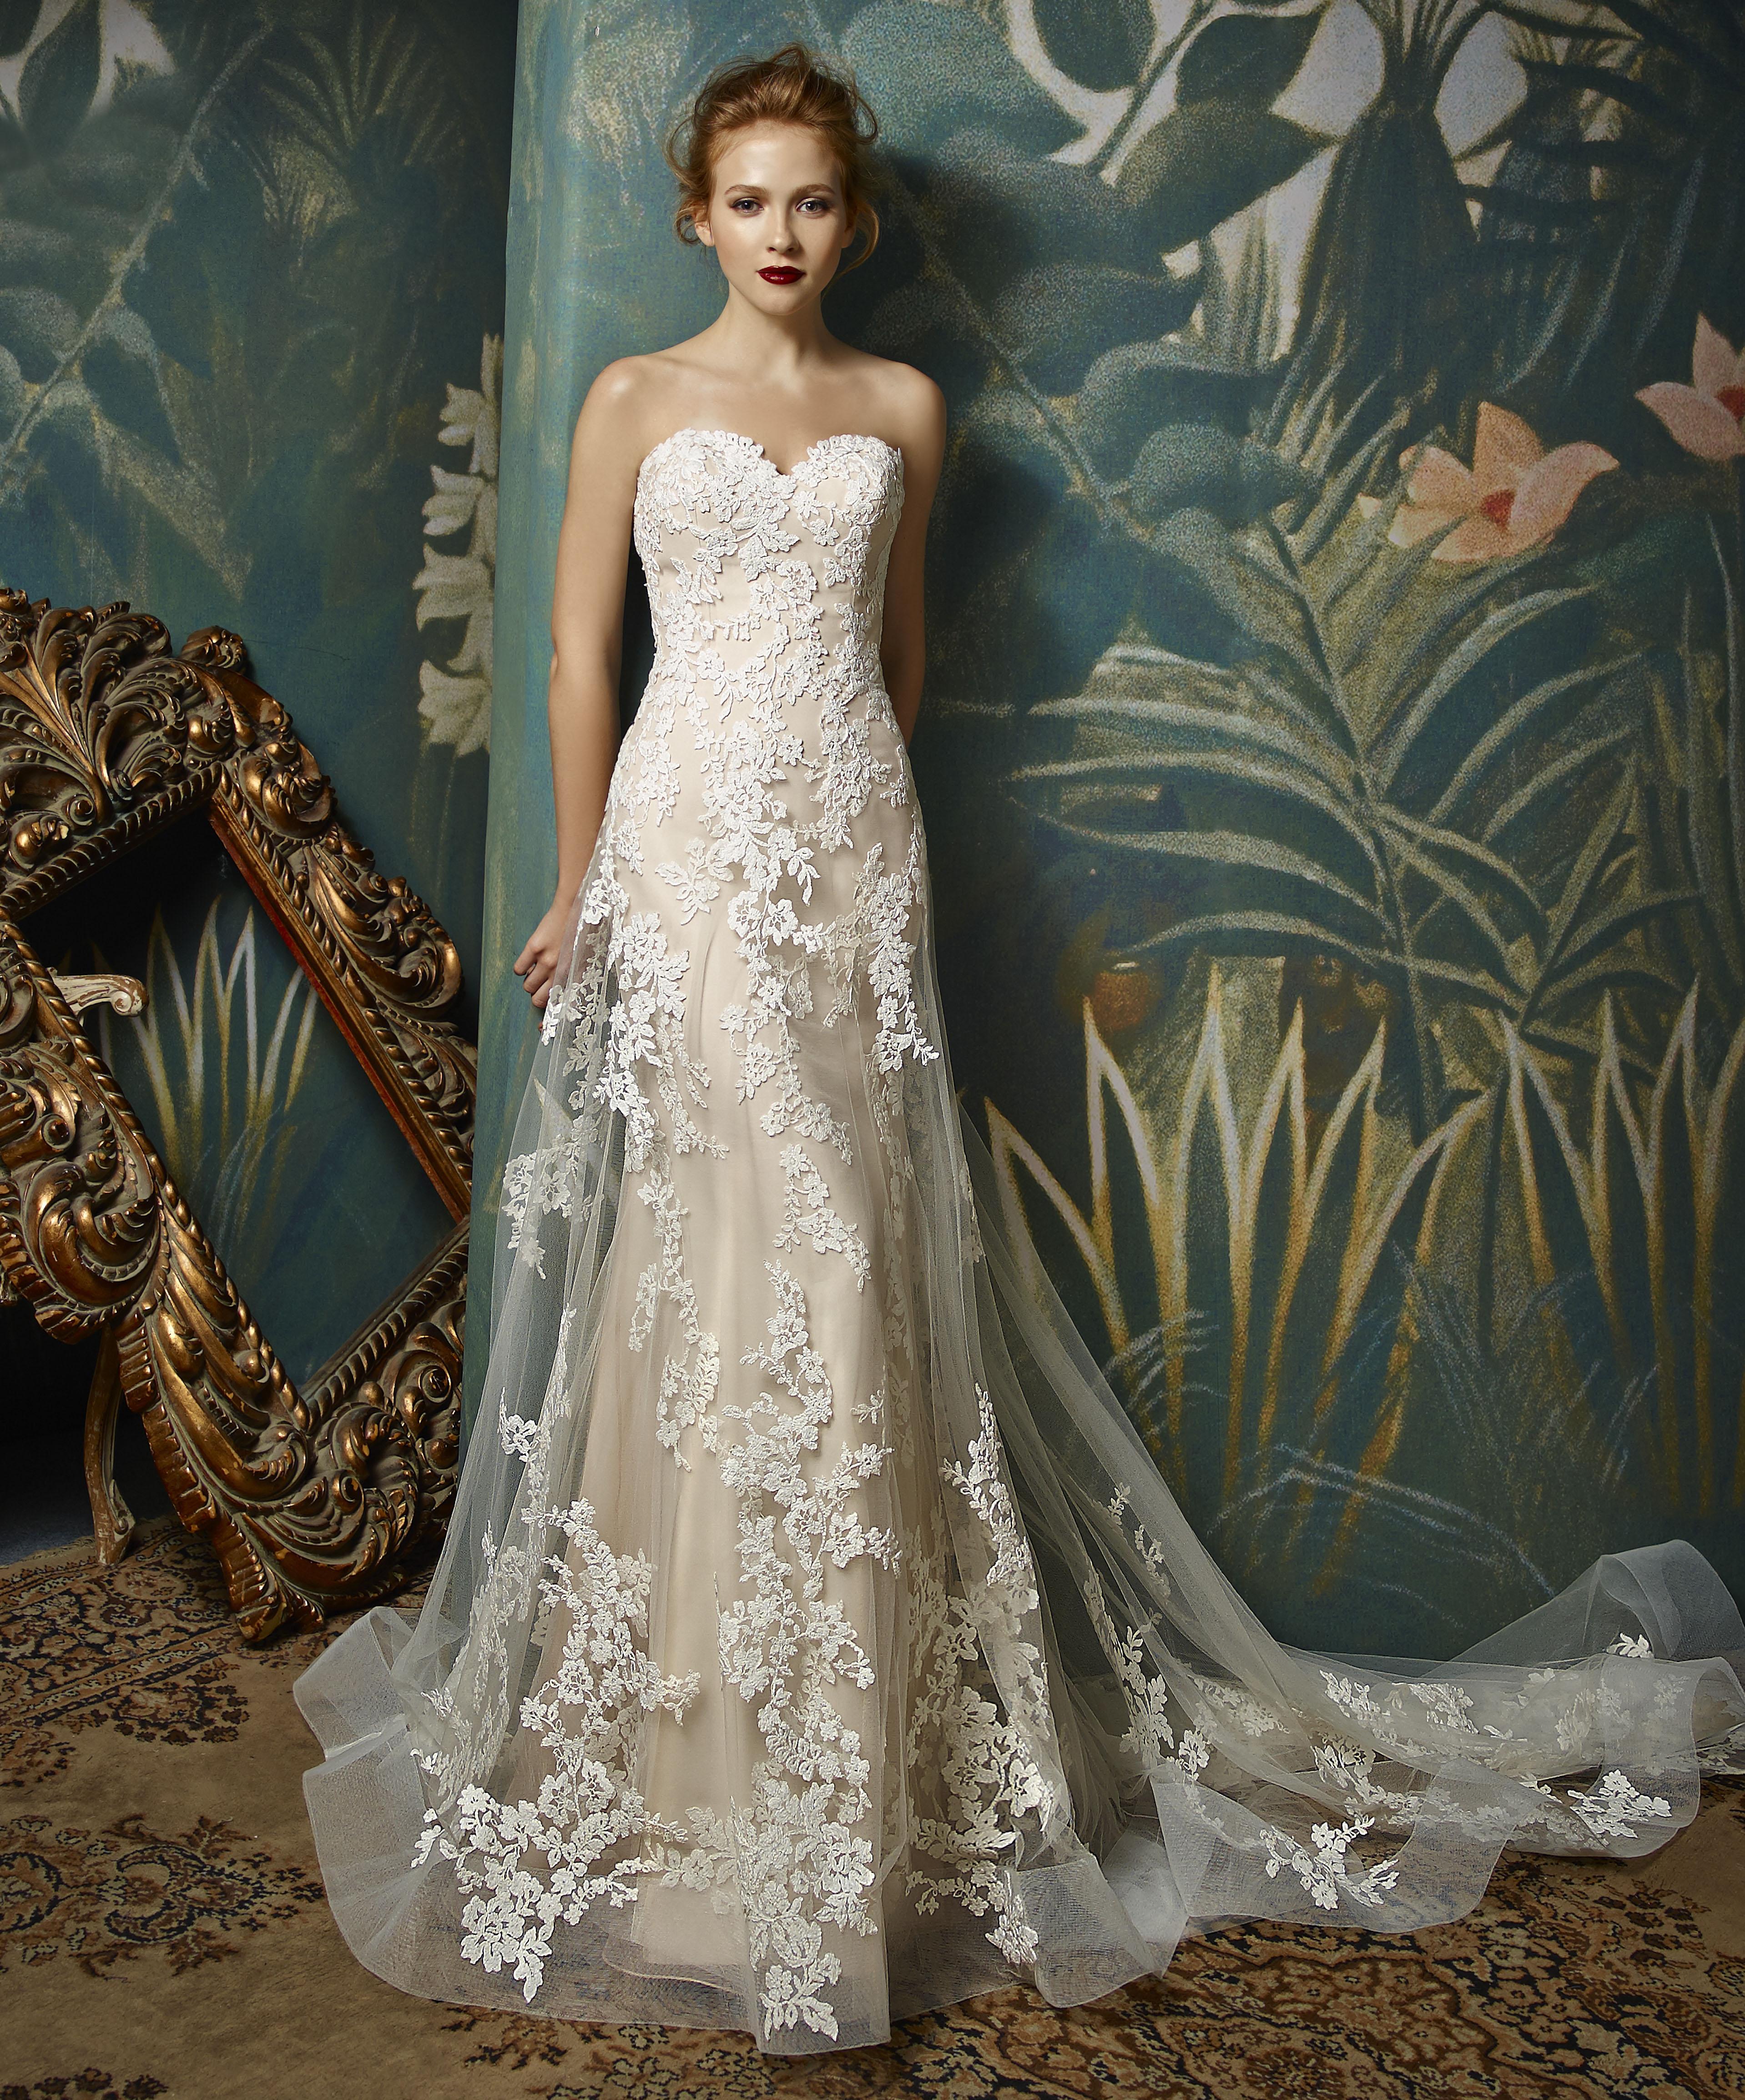 Enzoani Wedding Gown Lace wedding dress Jilly Sample Sale